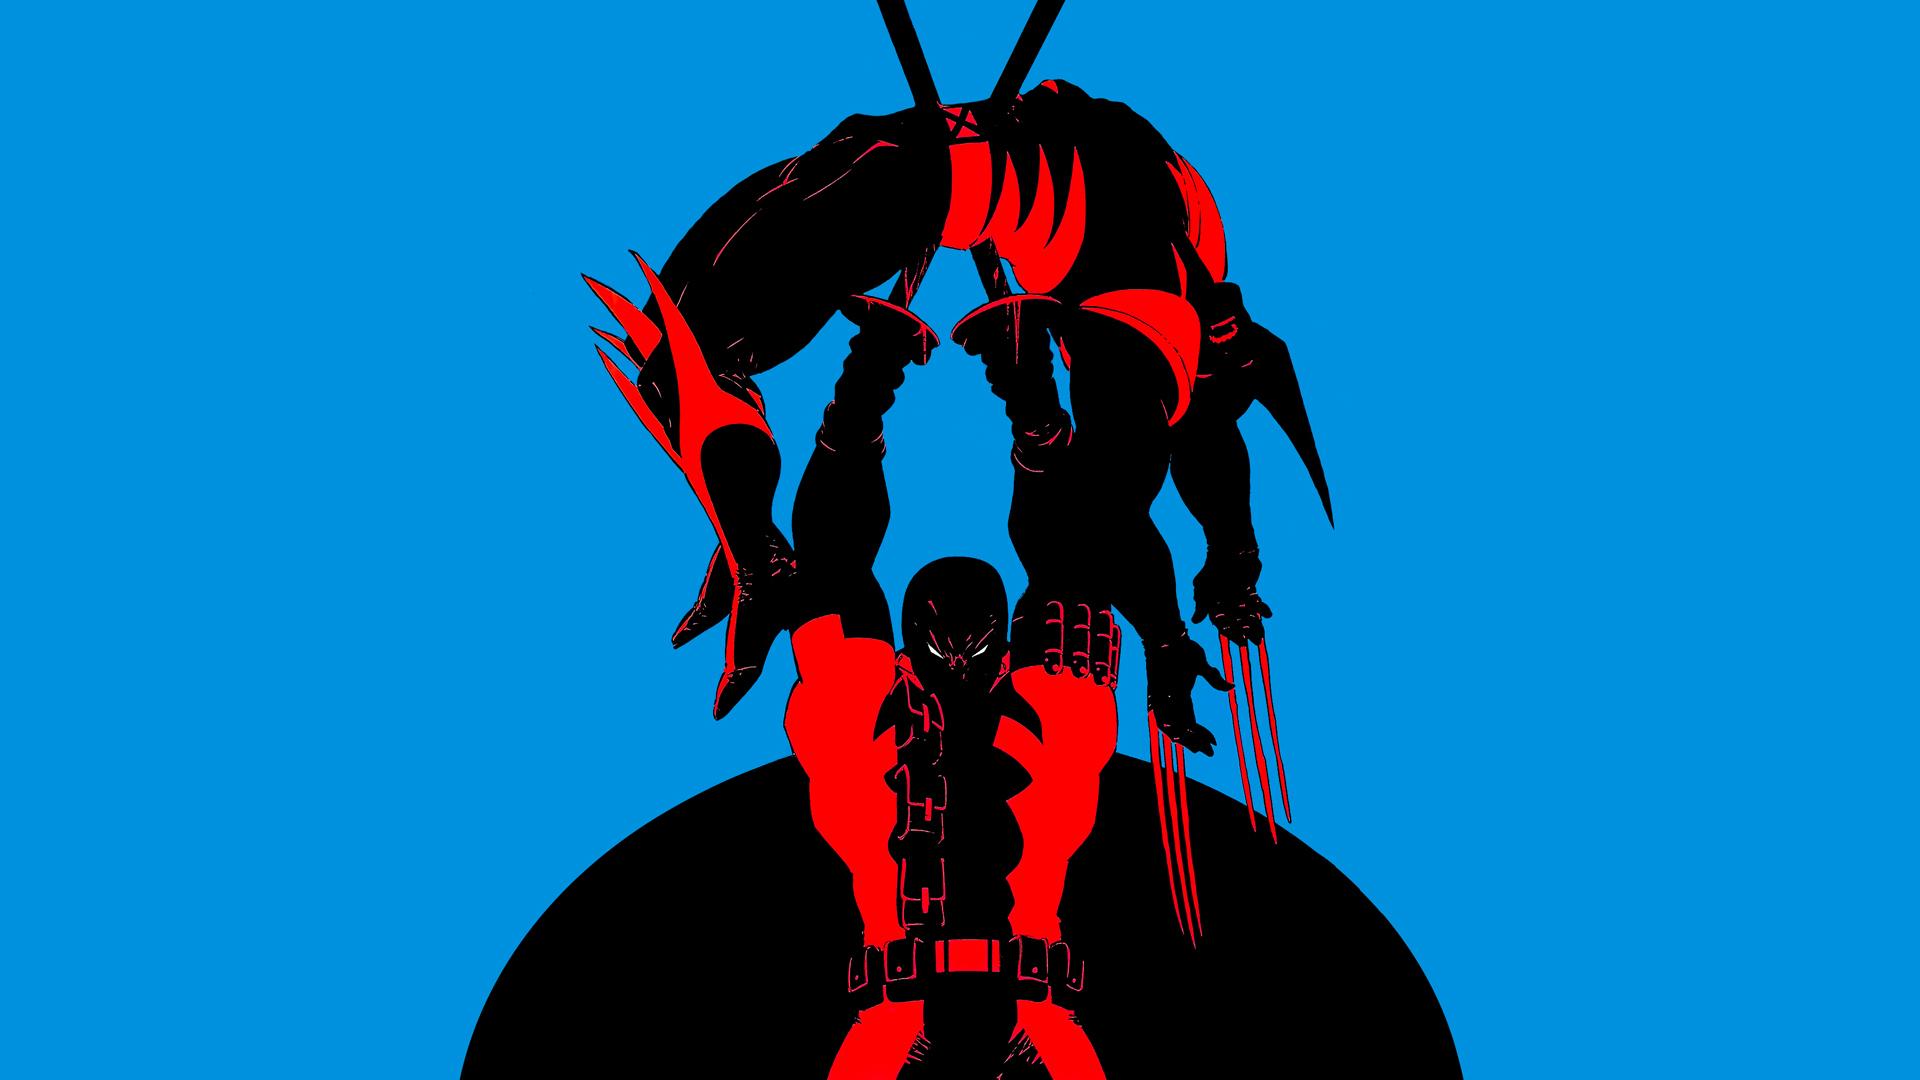 X Men Origins Wolverine vs Deadpool HD Wallpaper Background 1920x1080